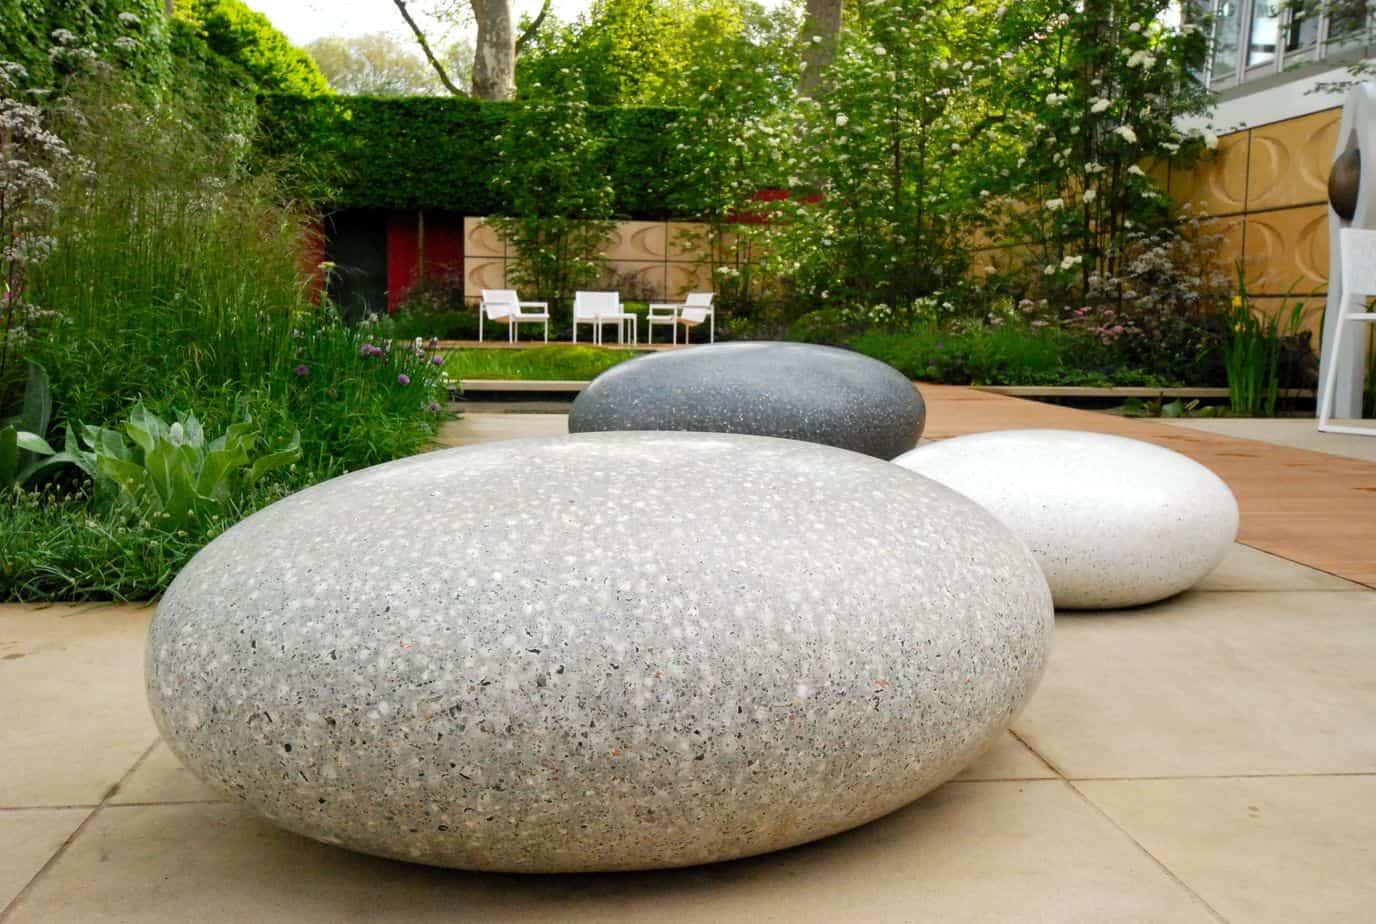 Stone pebble garden bench in oval shape